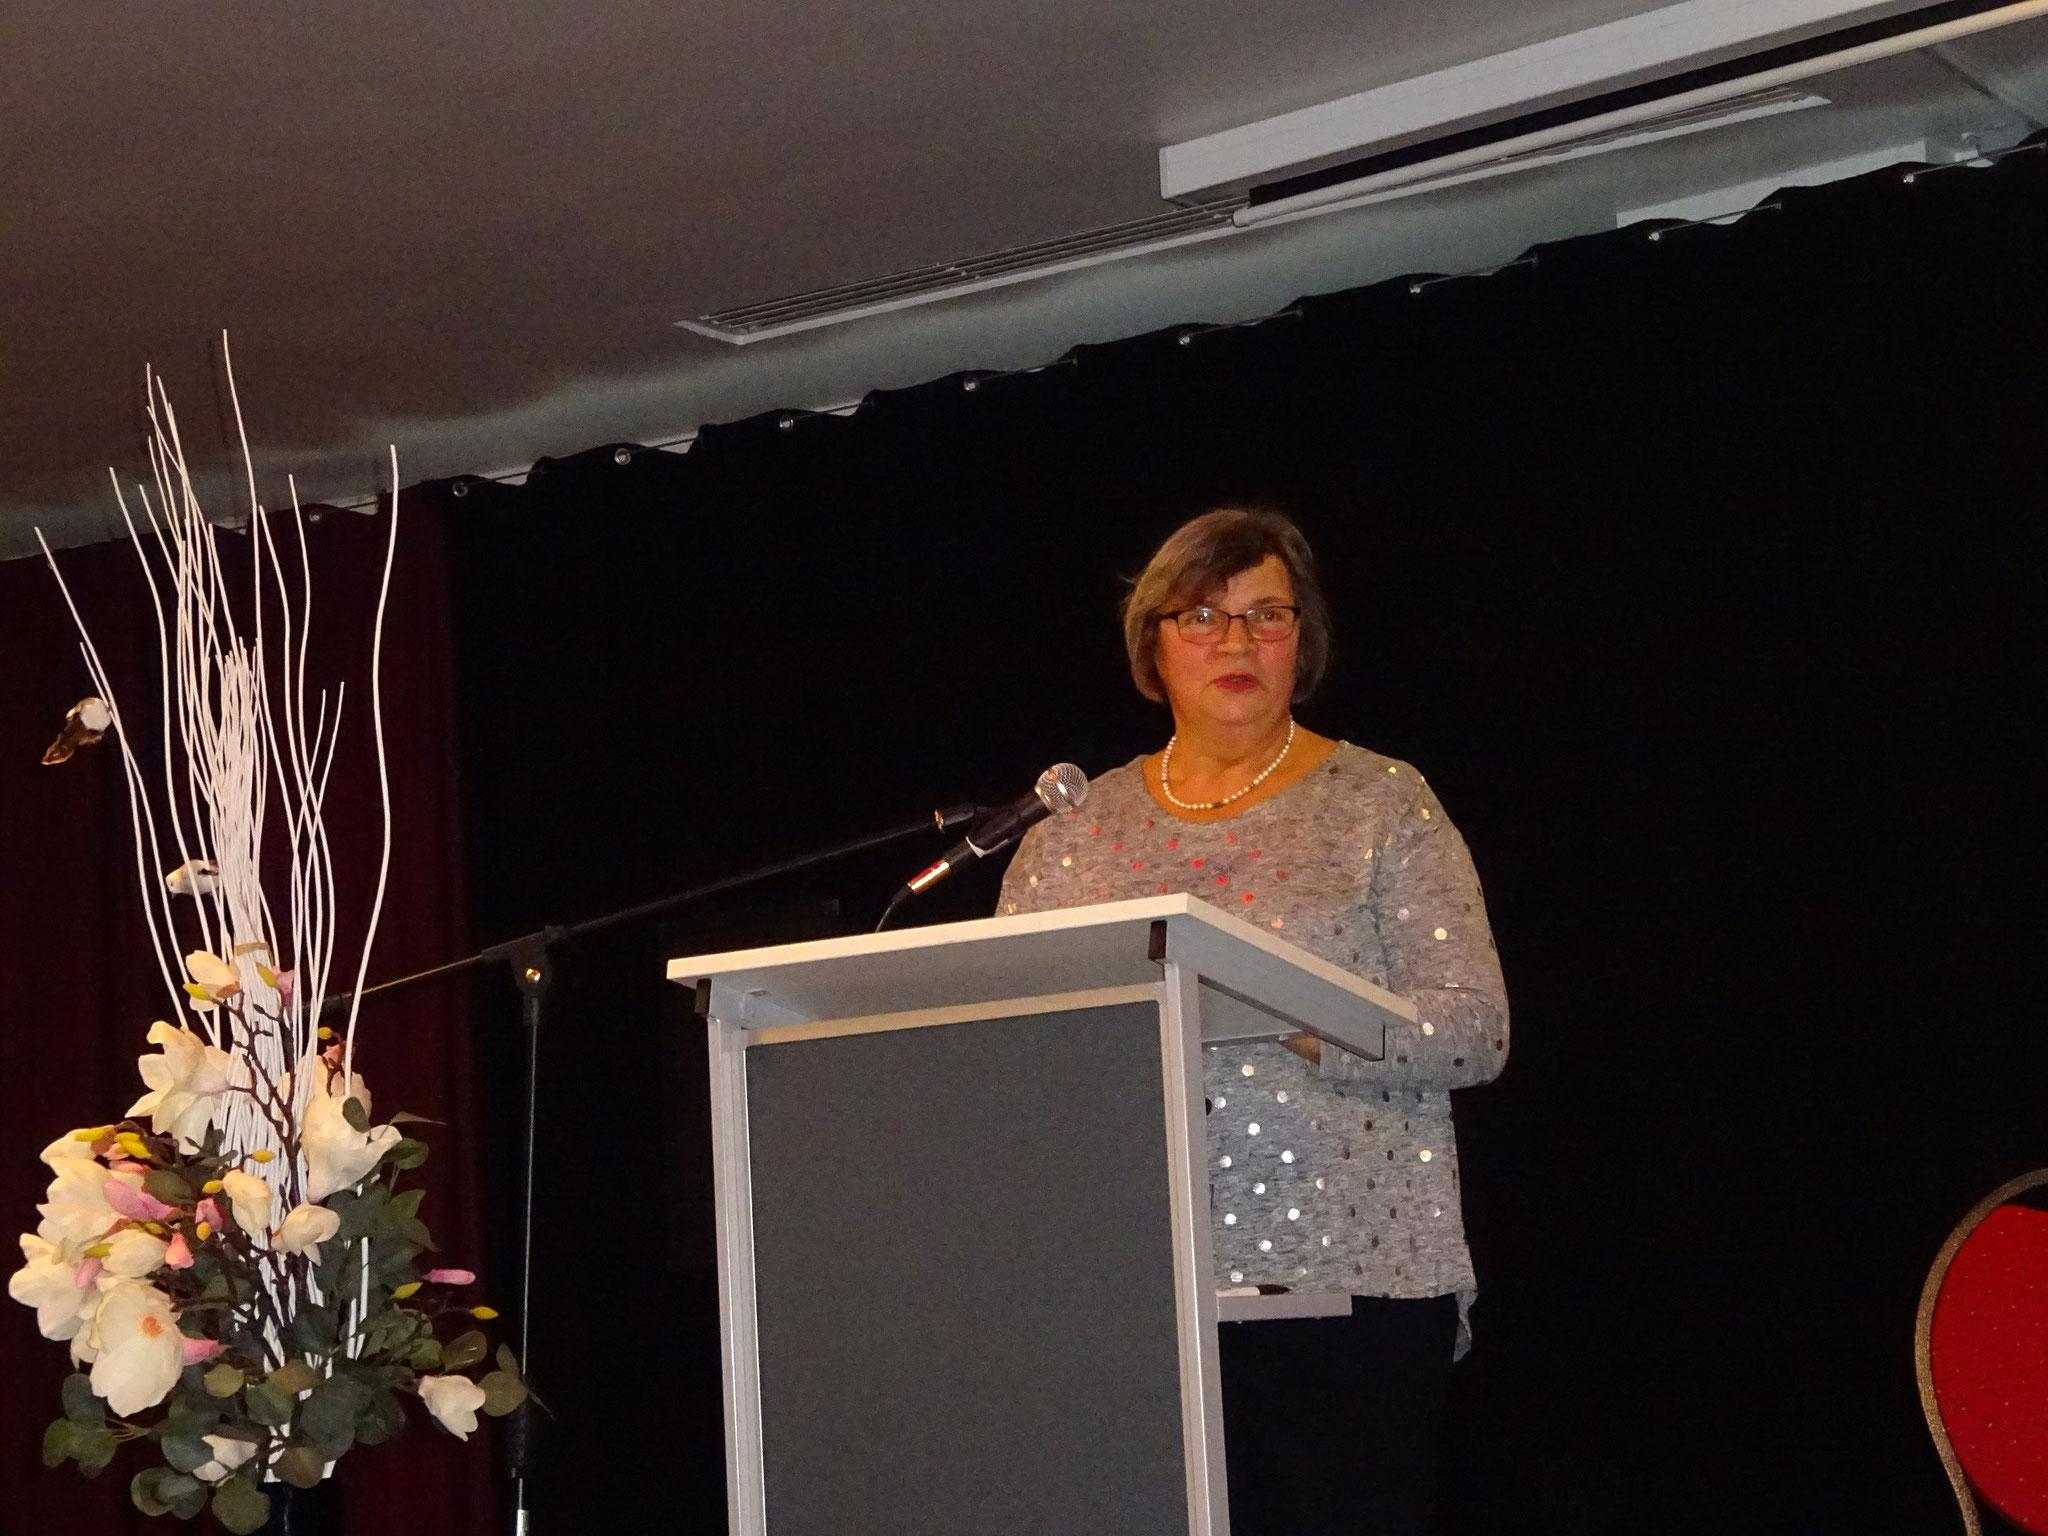 Grußwort Frau Claudia Peschel, Amt Bad Bramstedt - Land